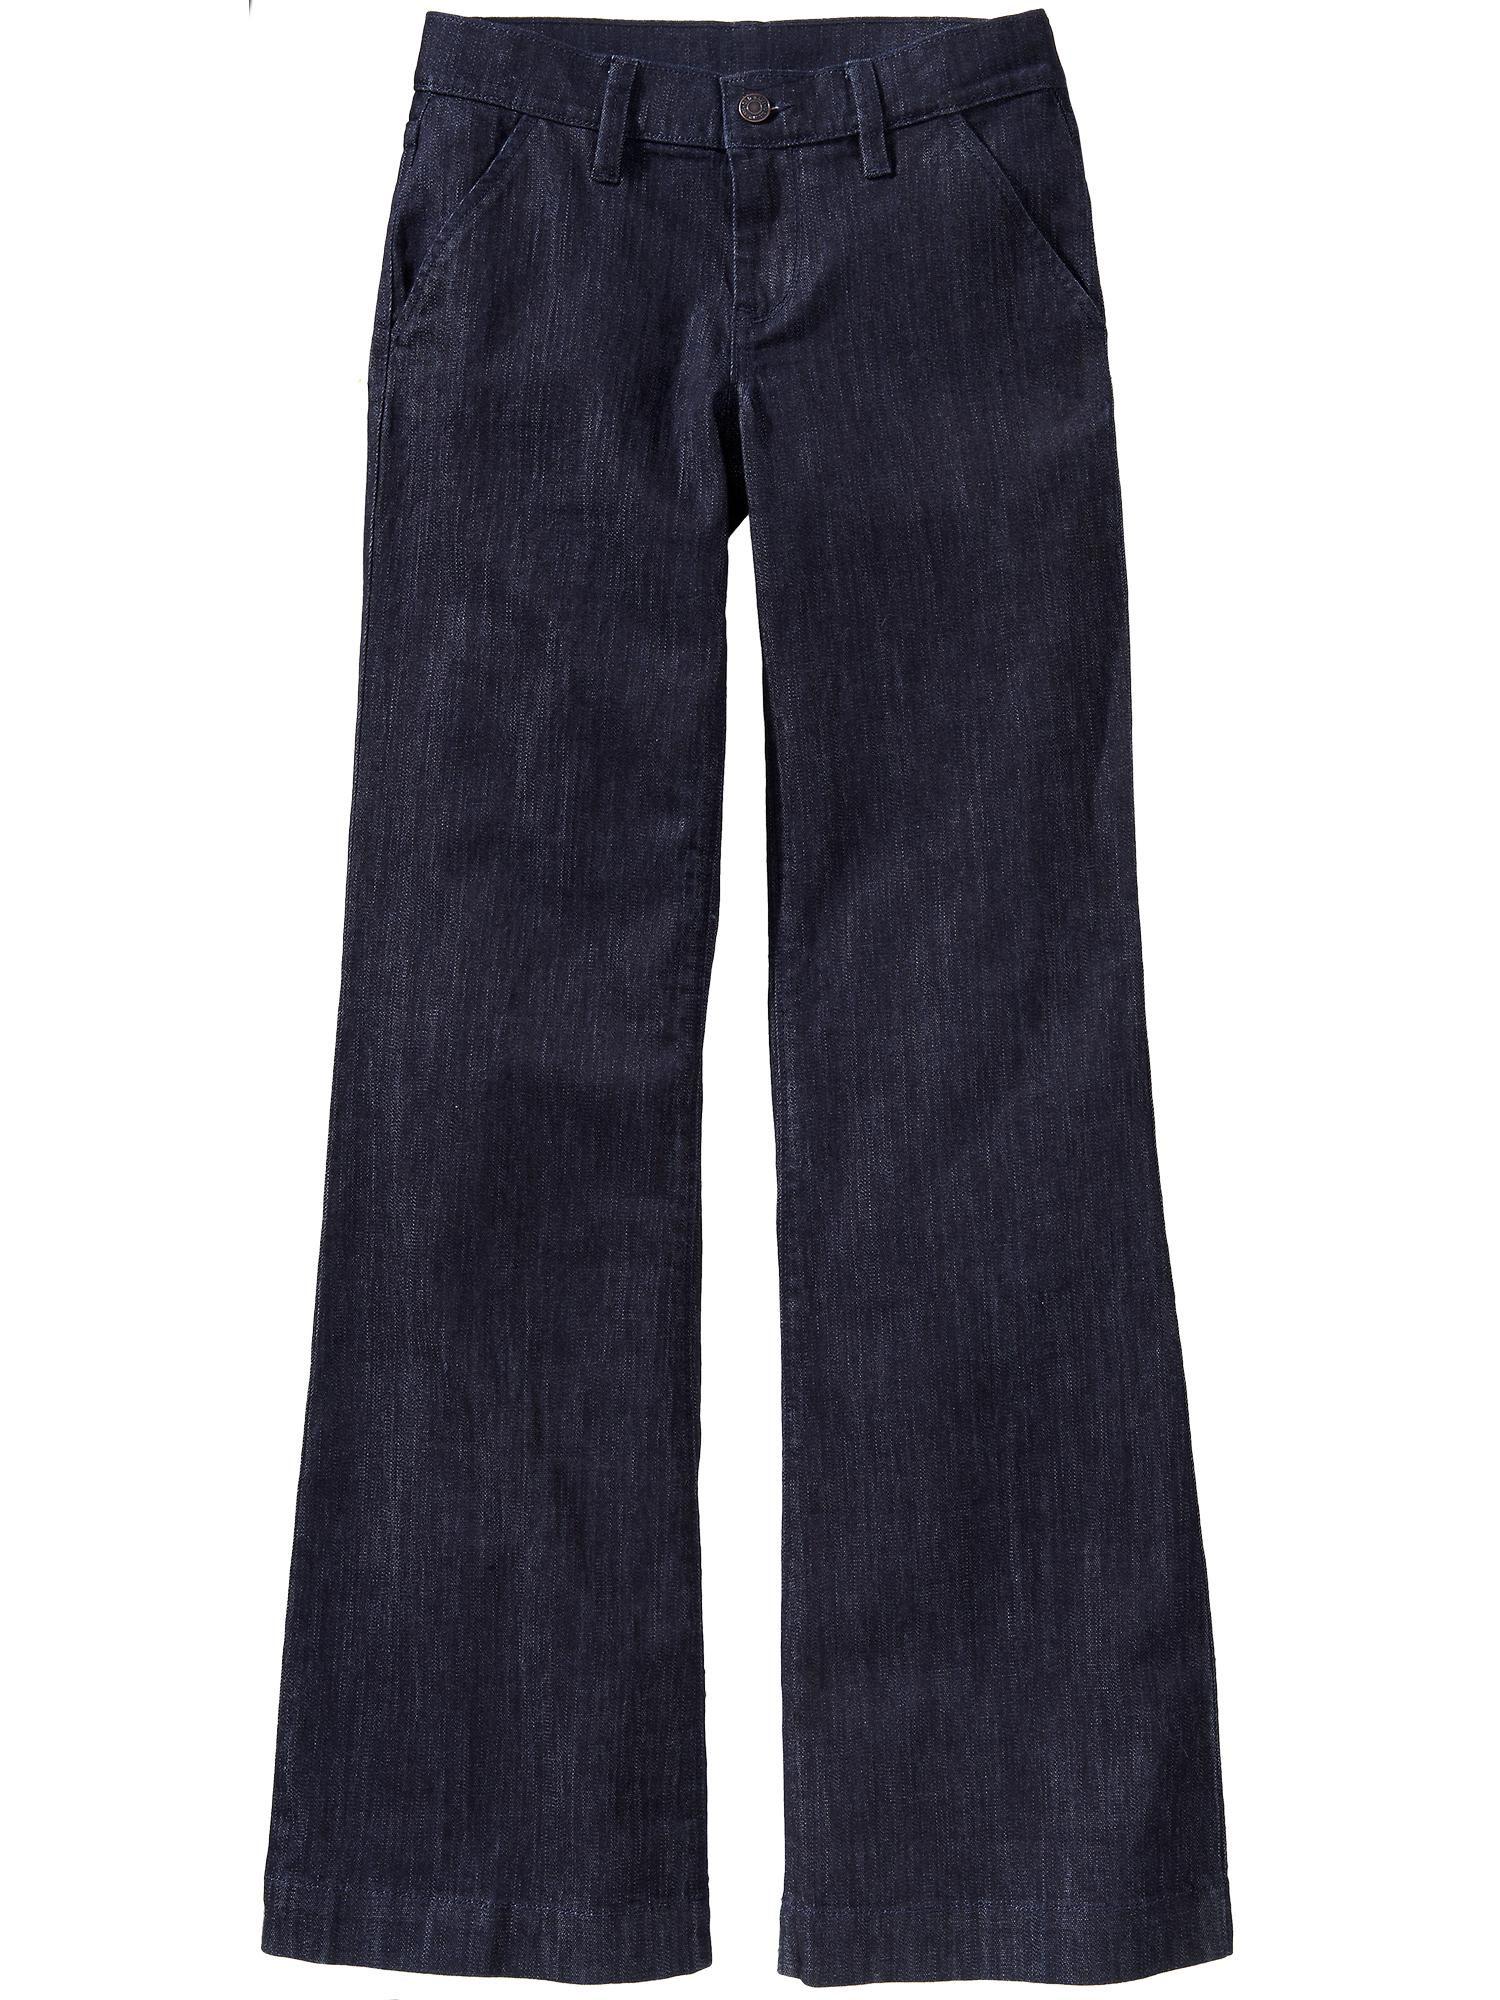 910abdc2564f4f Women's Wide-Leg Trouser Jeans Old Navy | Style>Jeans | Trouser ...